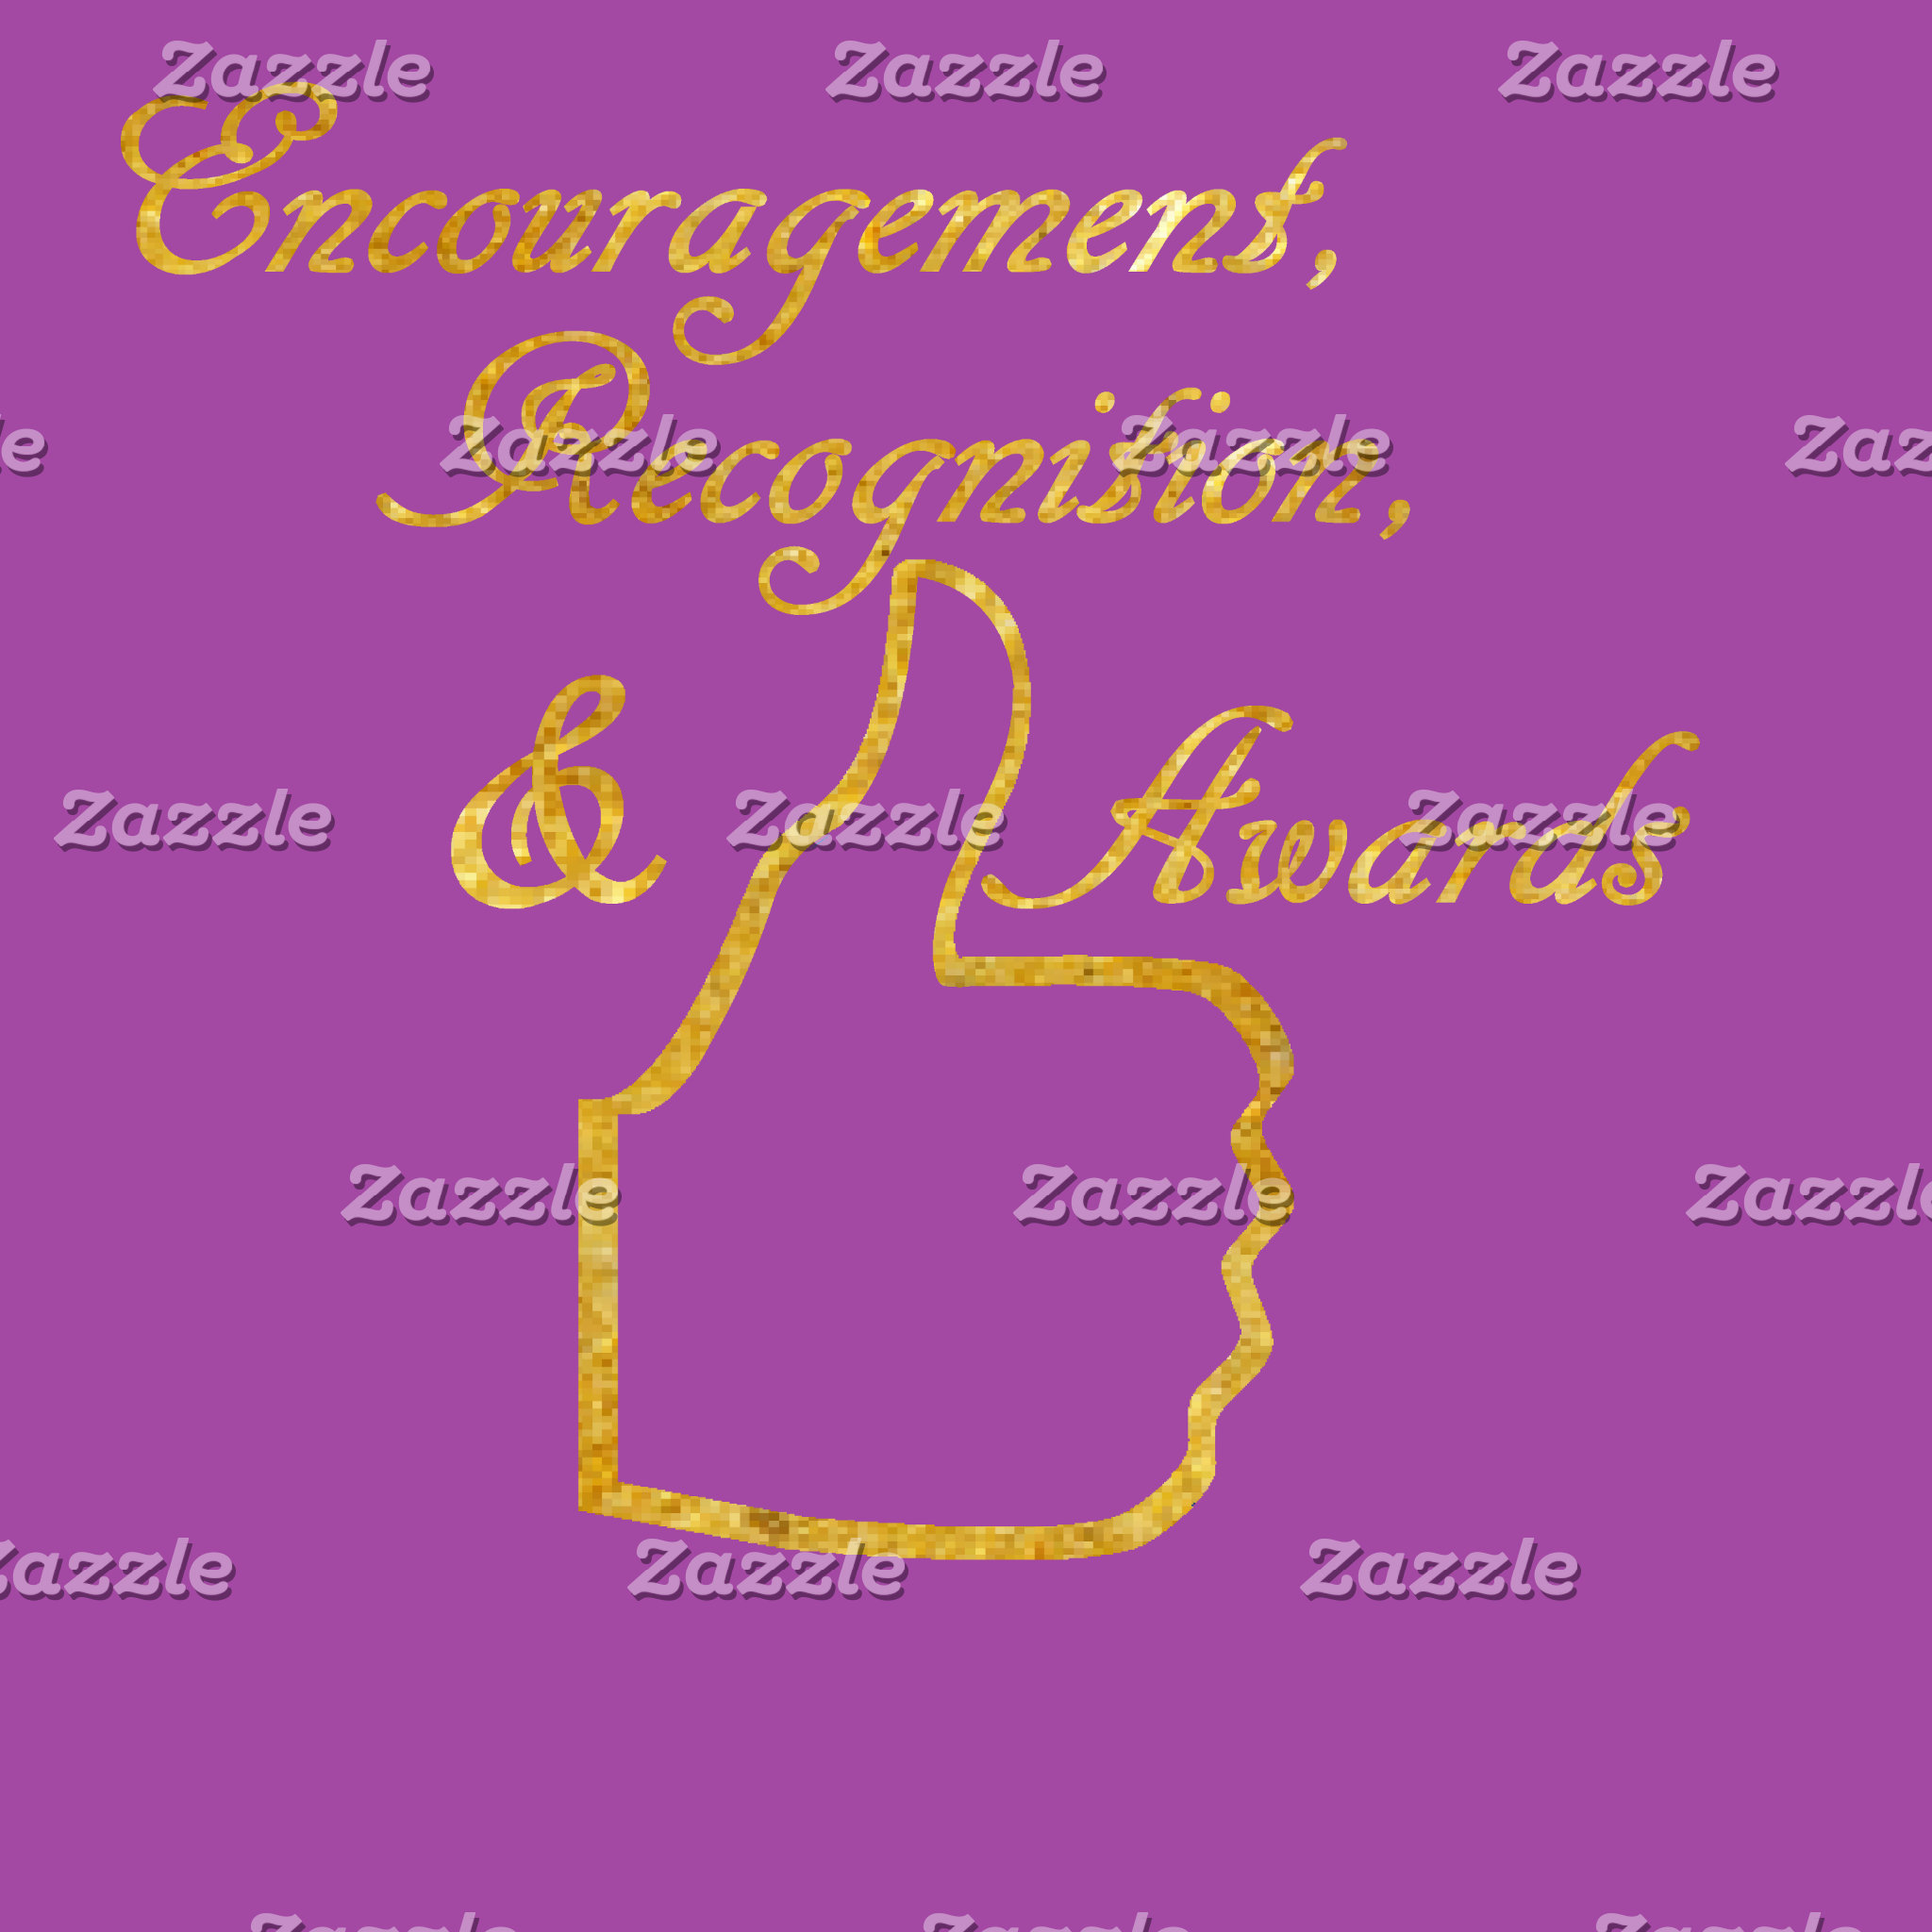 Encouragement, Recognition, & Awards